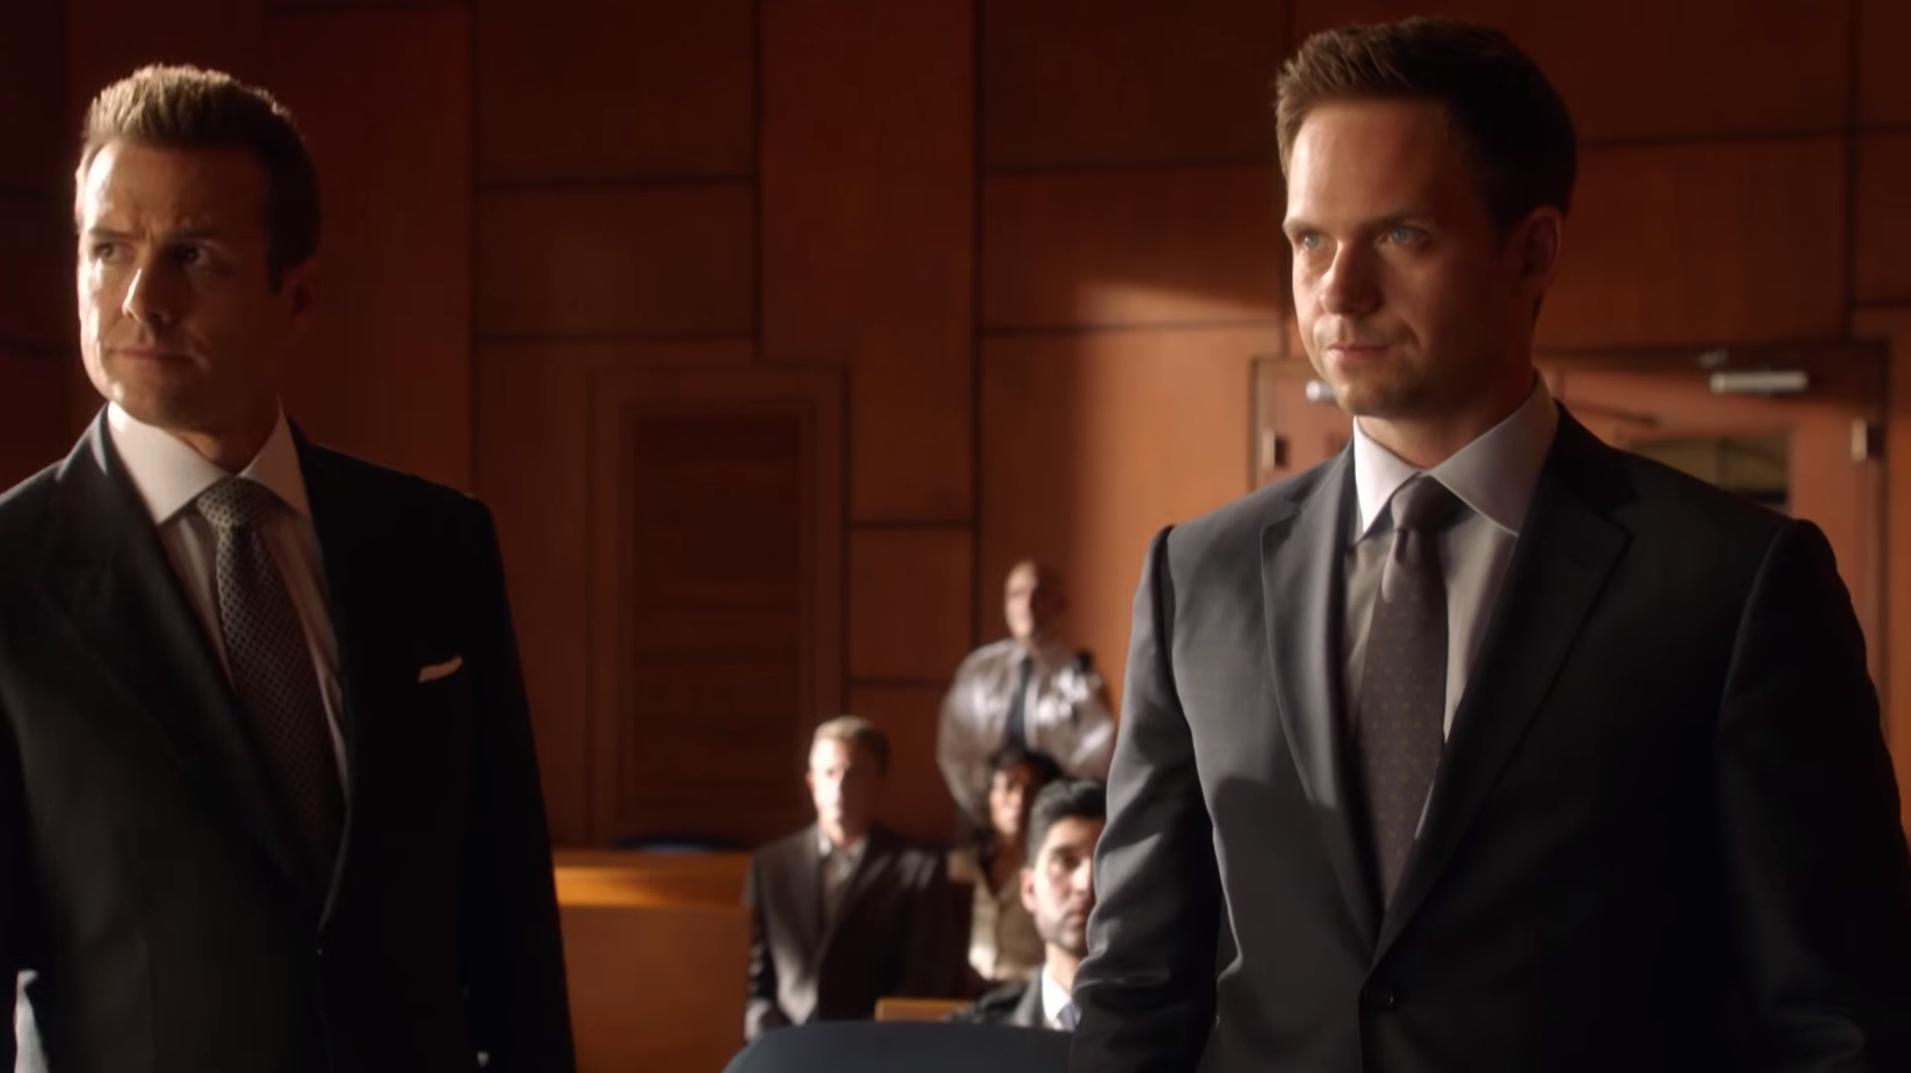 Suits Staffel 8: Wann kommt die neue Season? Starttermin